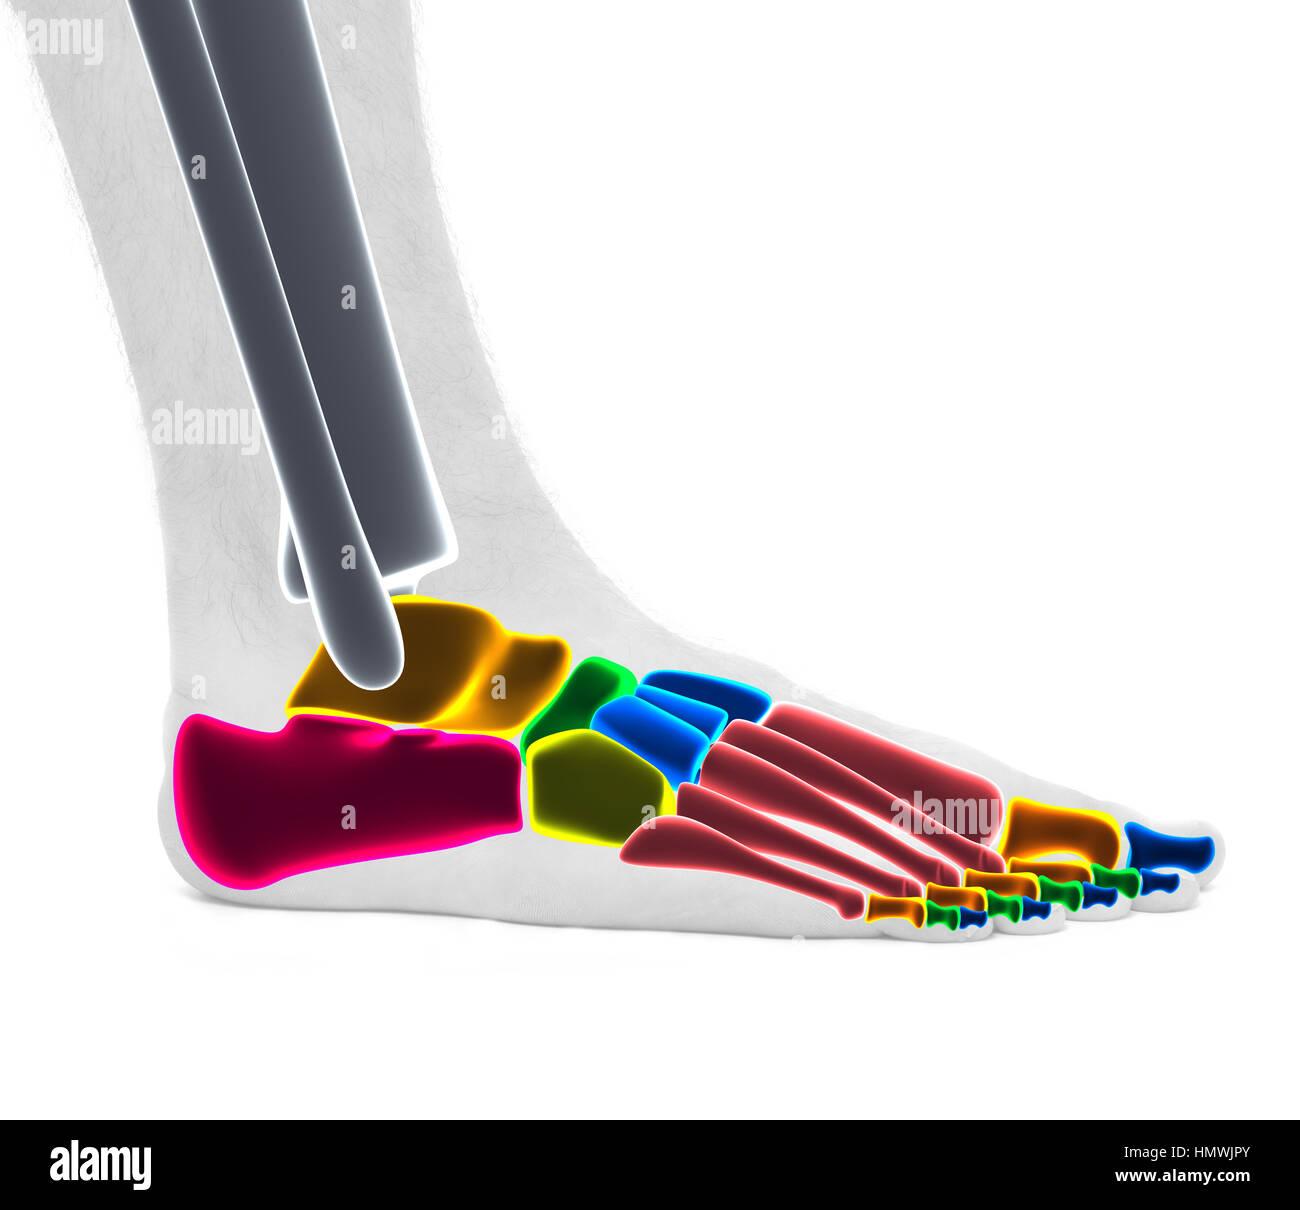 Foot Ankle Bones Anatomy Male Studio Photo Isolated On White